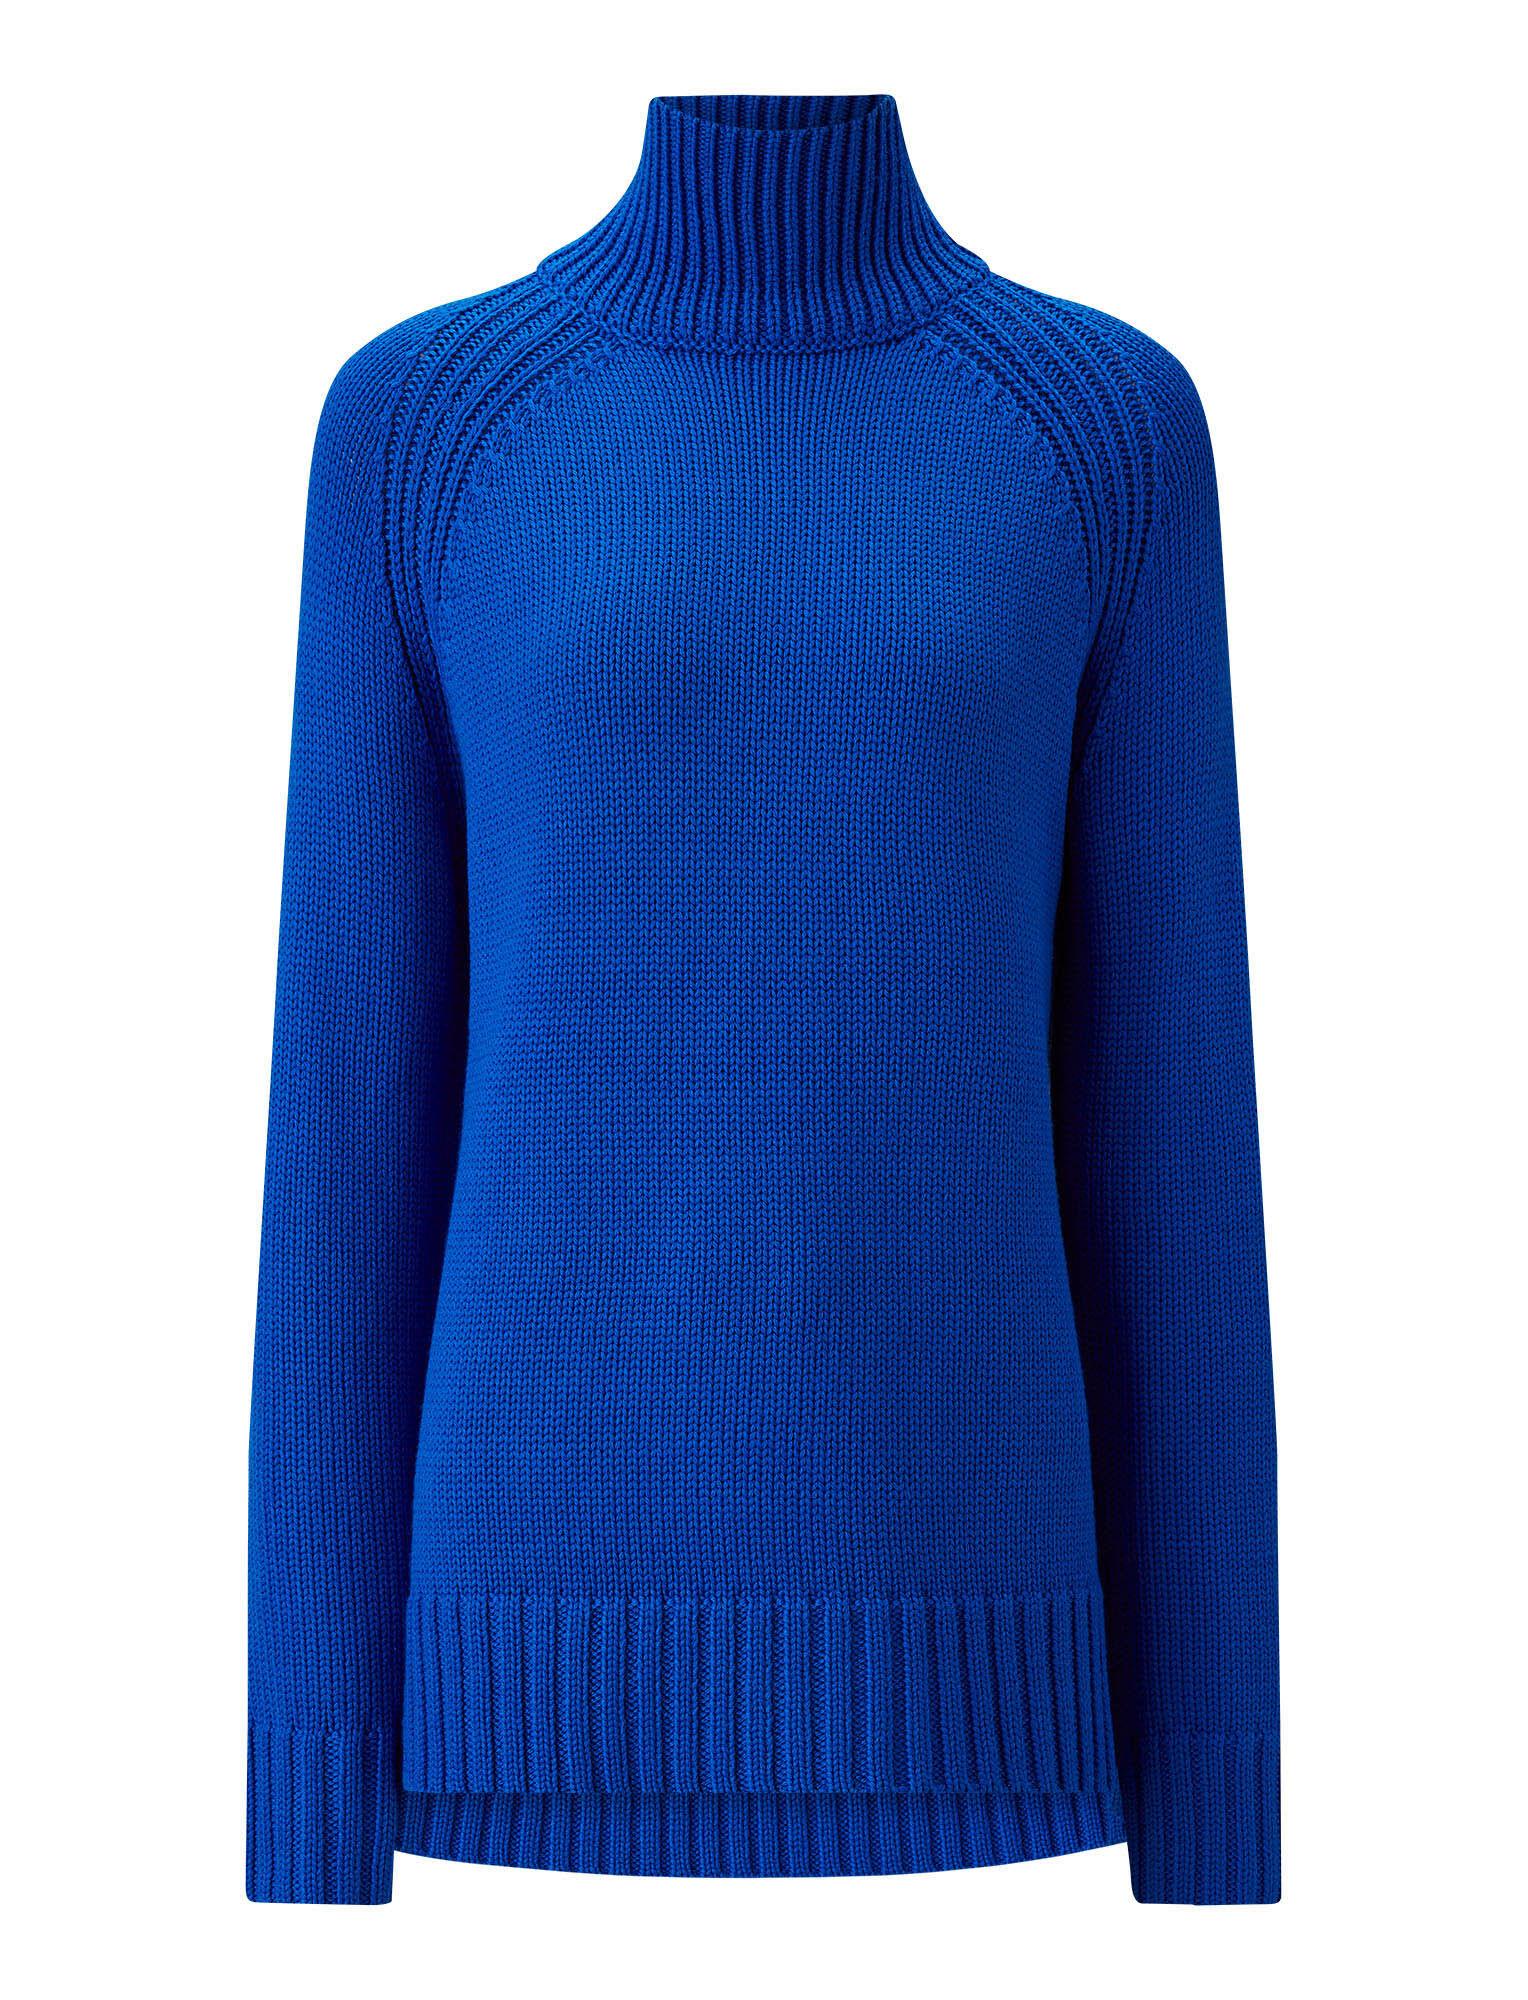 Joseph, New High Neck Sloppy Joe Knit, in PLASTIC BLUE